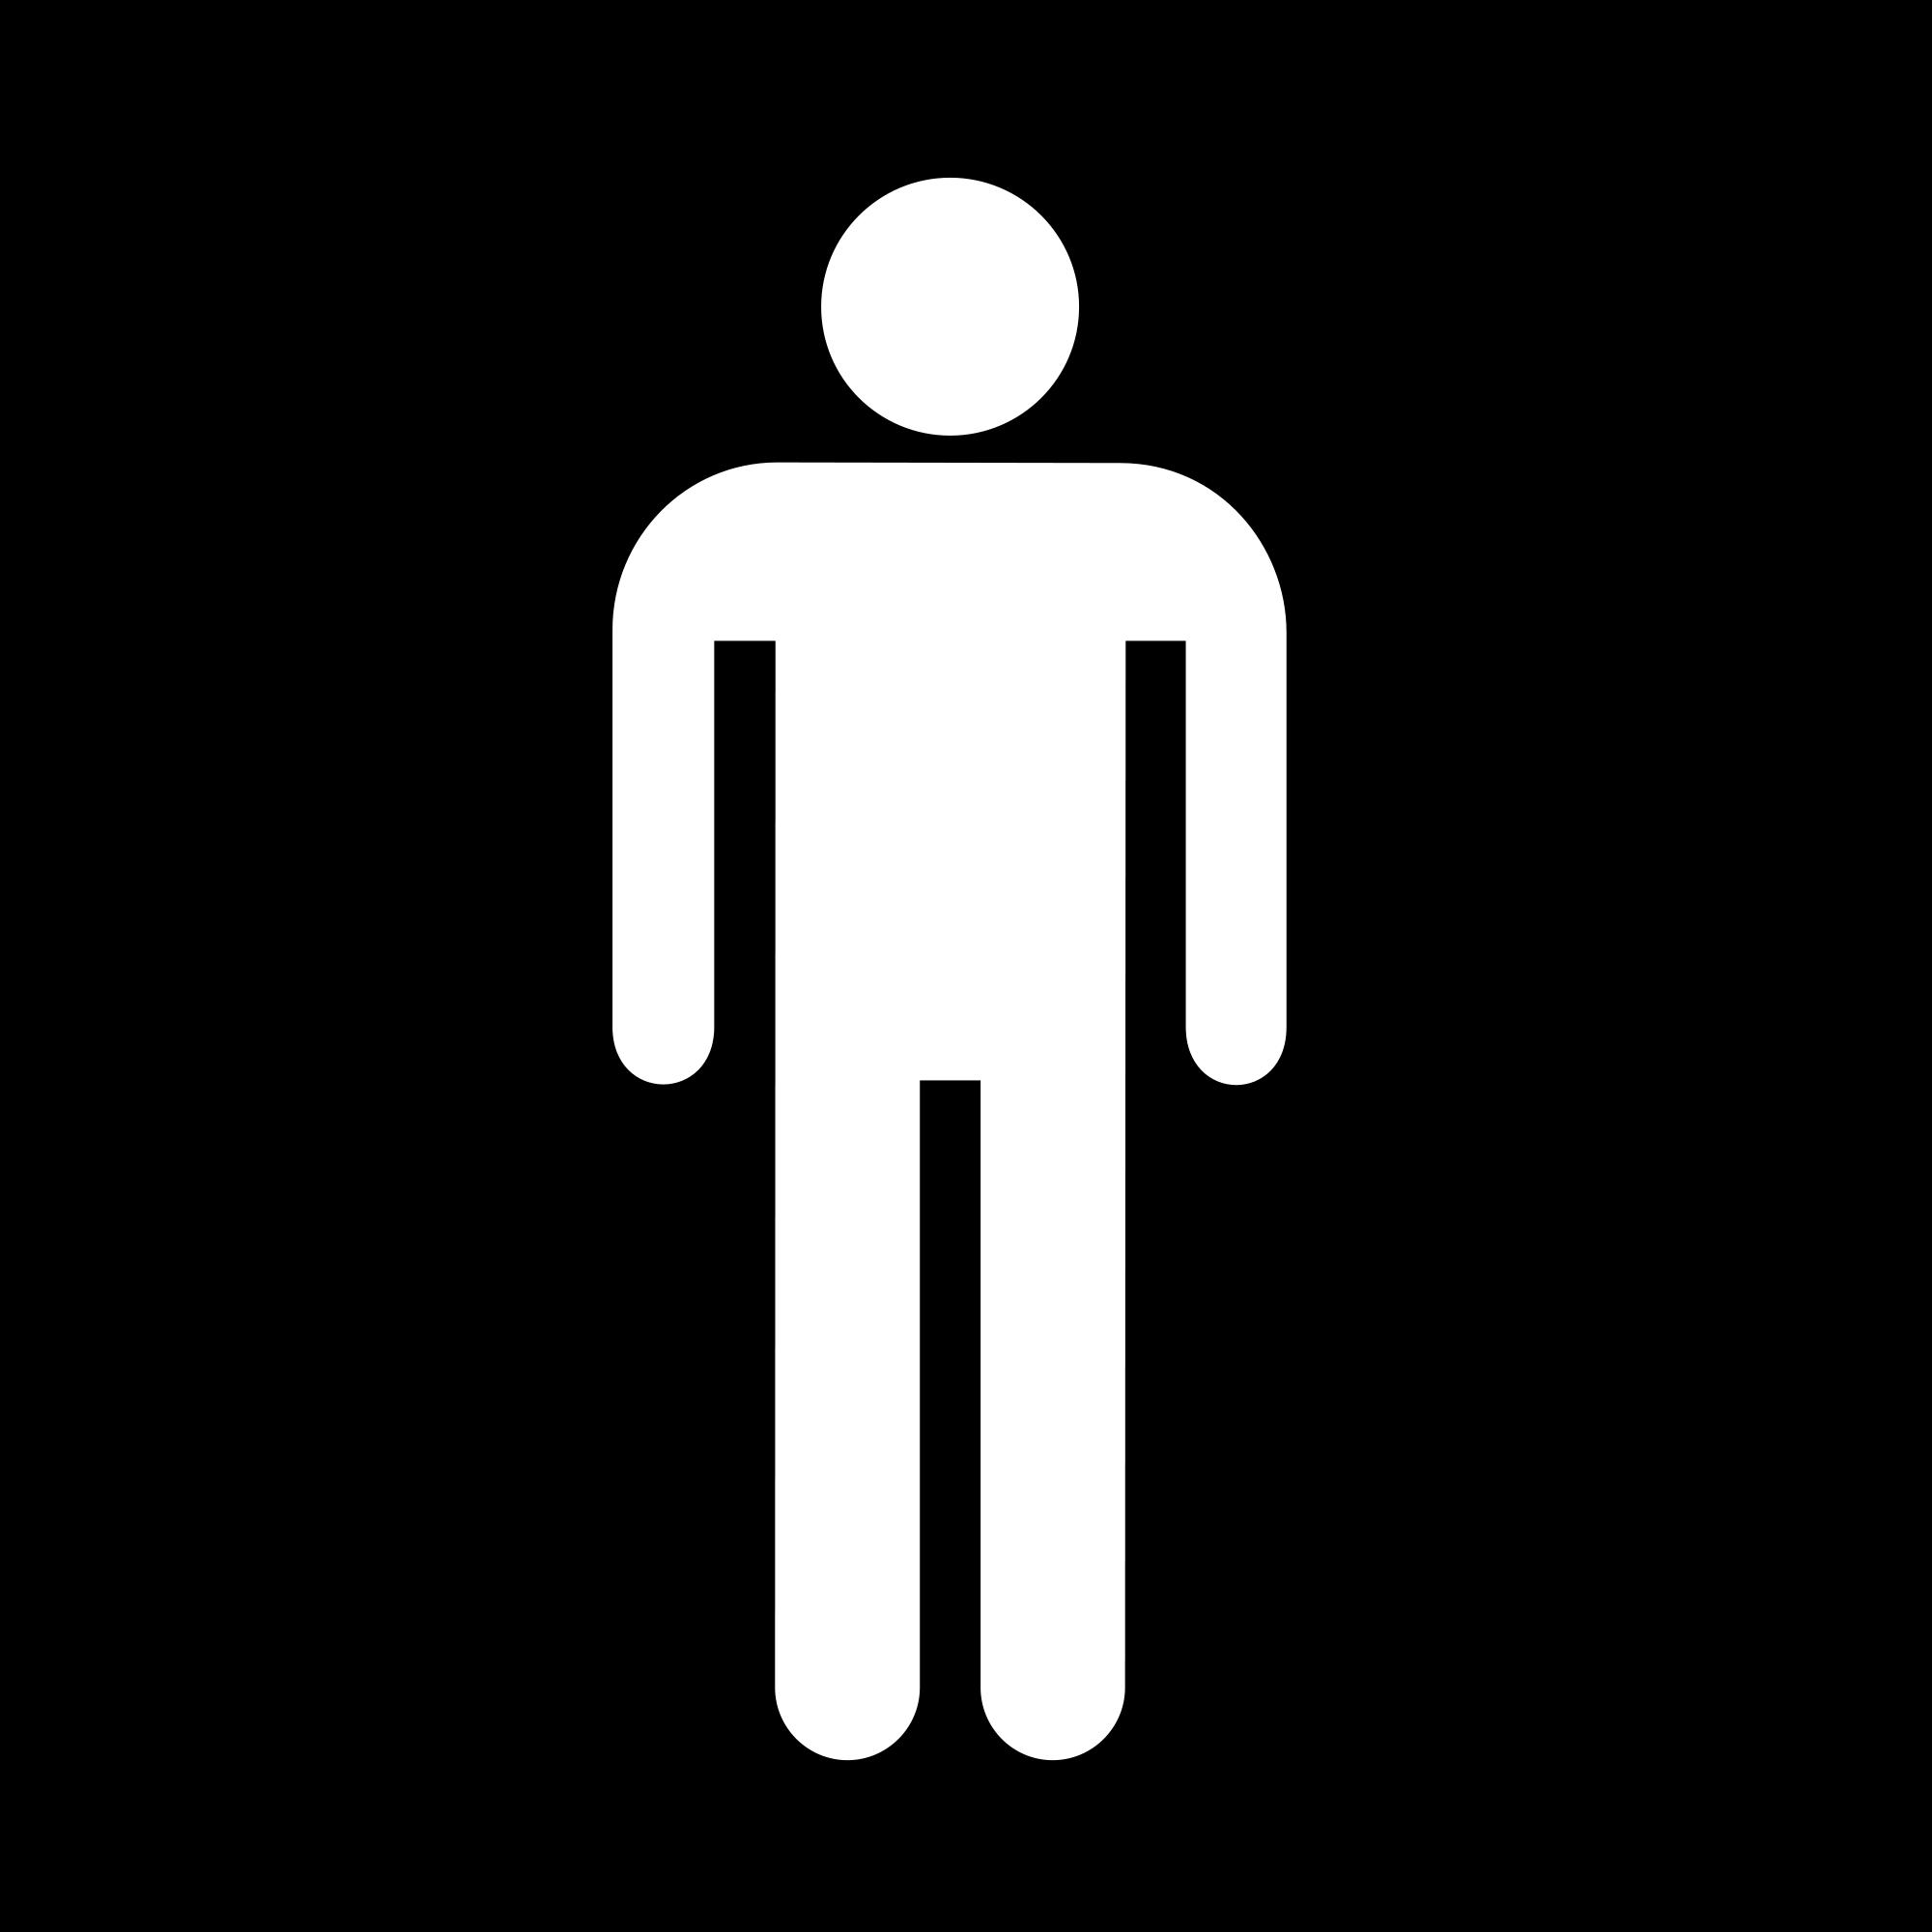 Restroom Symbols Pictograms Clipart Best